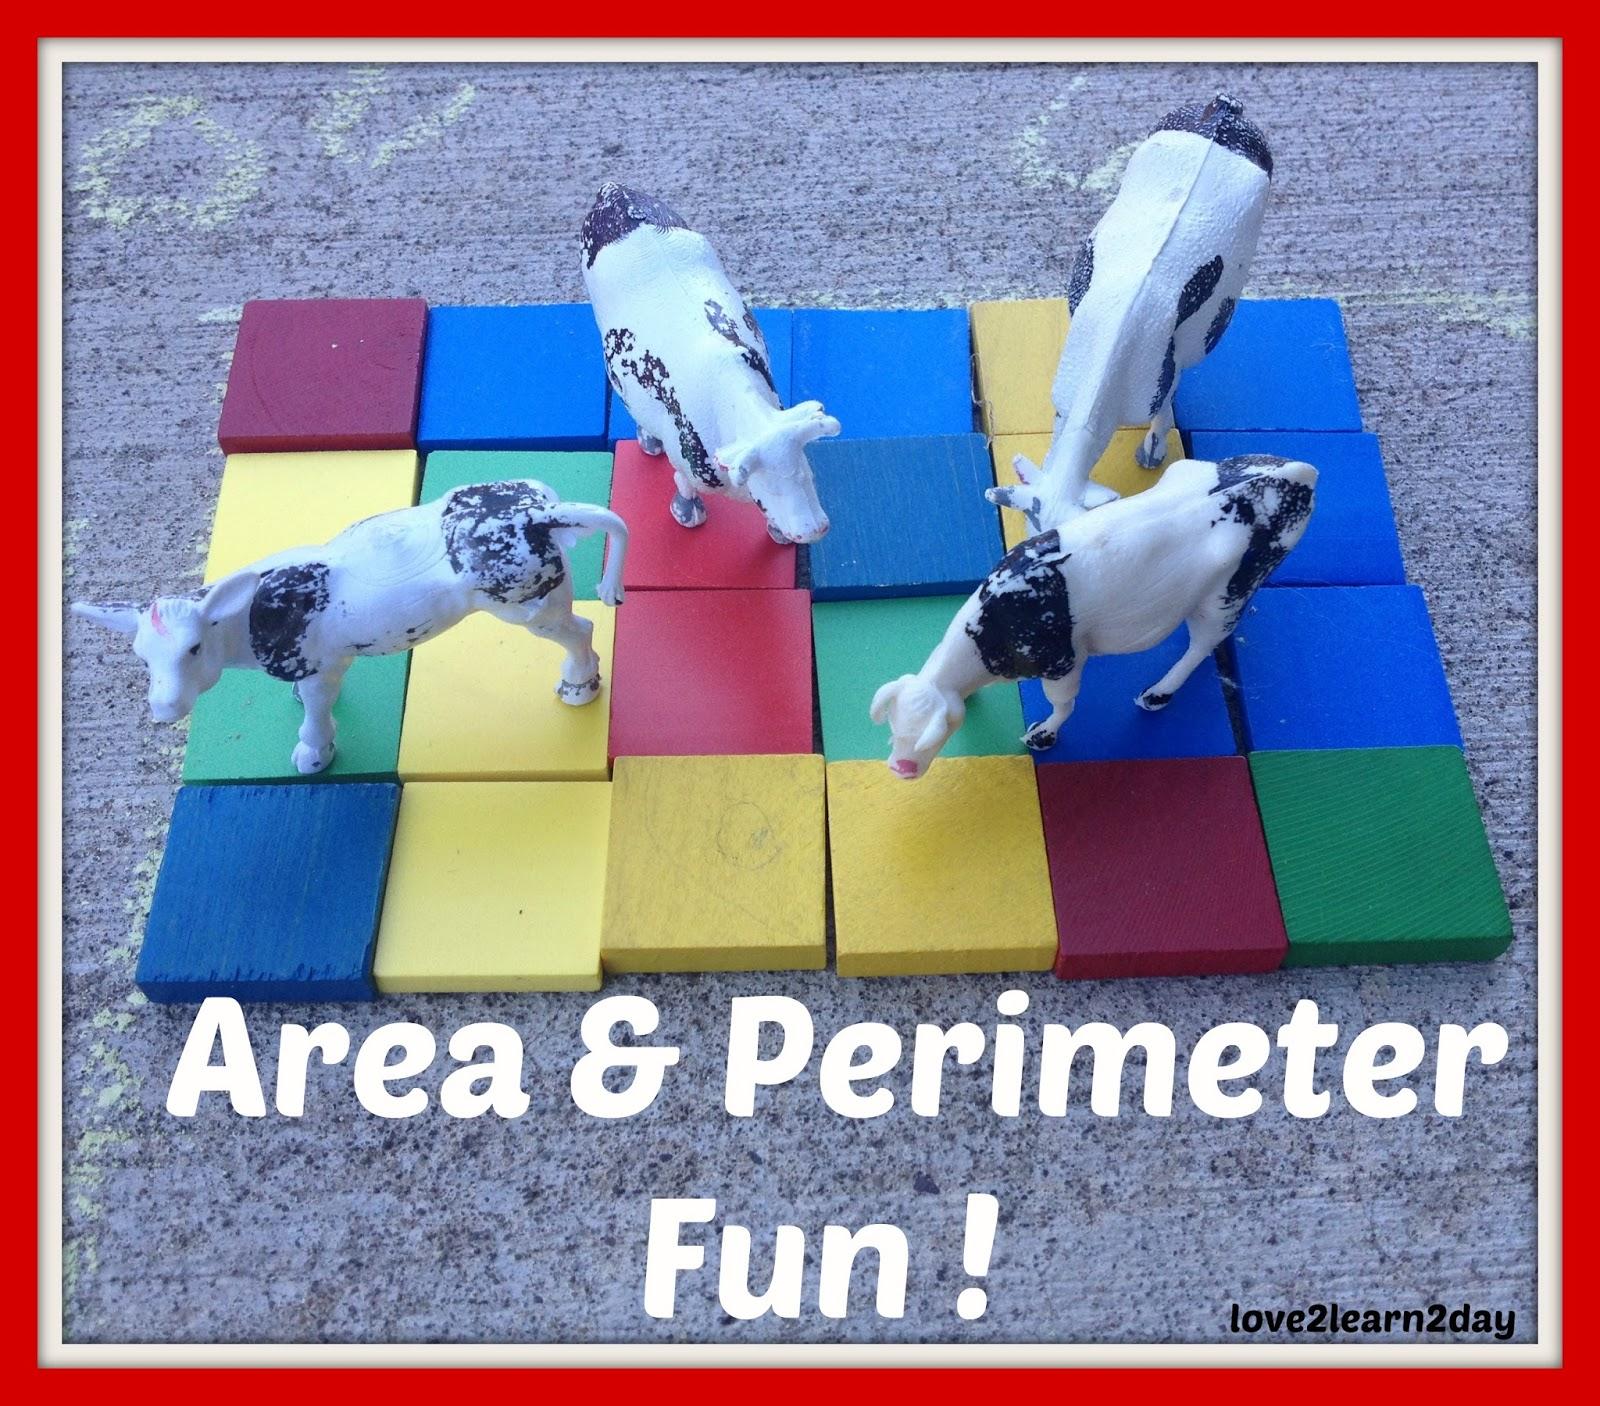 Love2learn2day Chalk Animals Amp Tile Summertime Fun